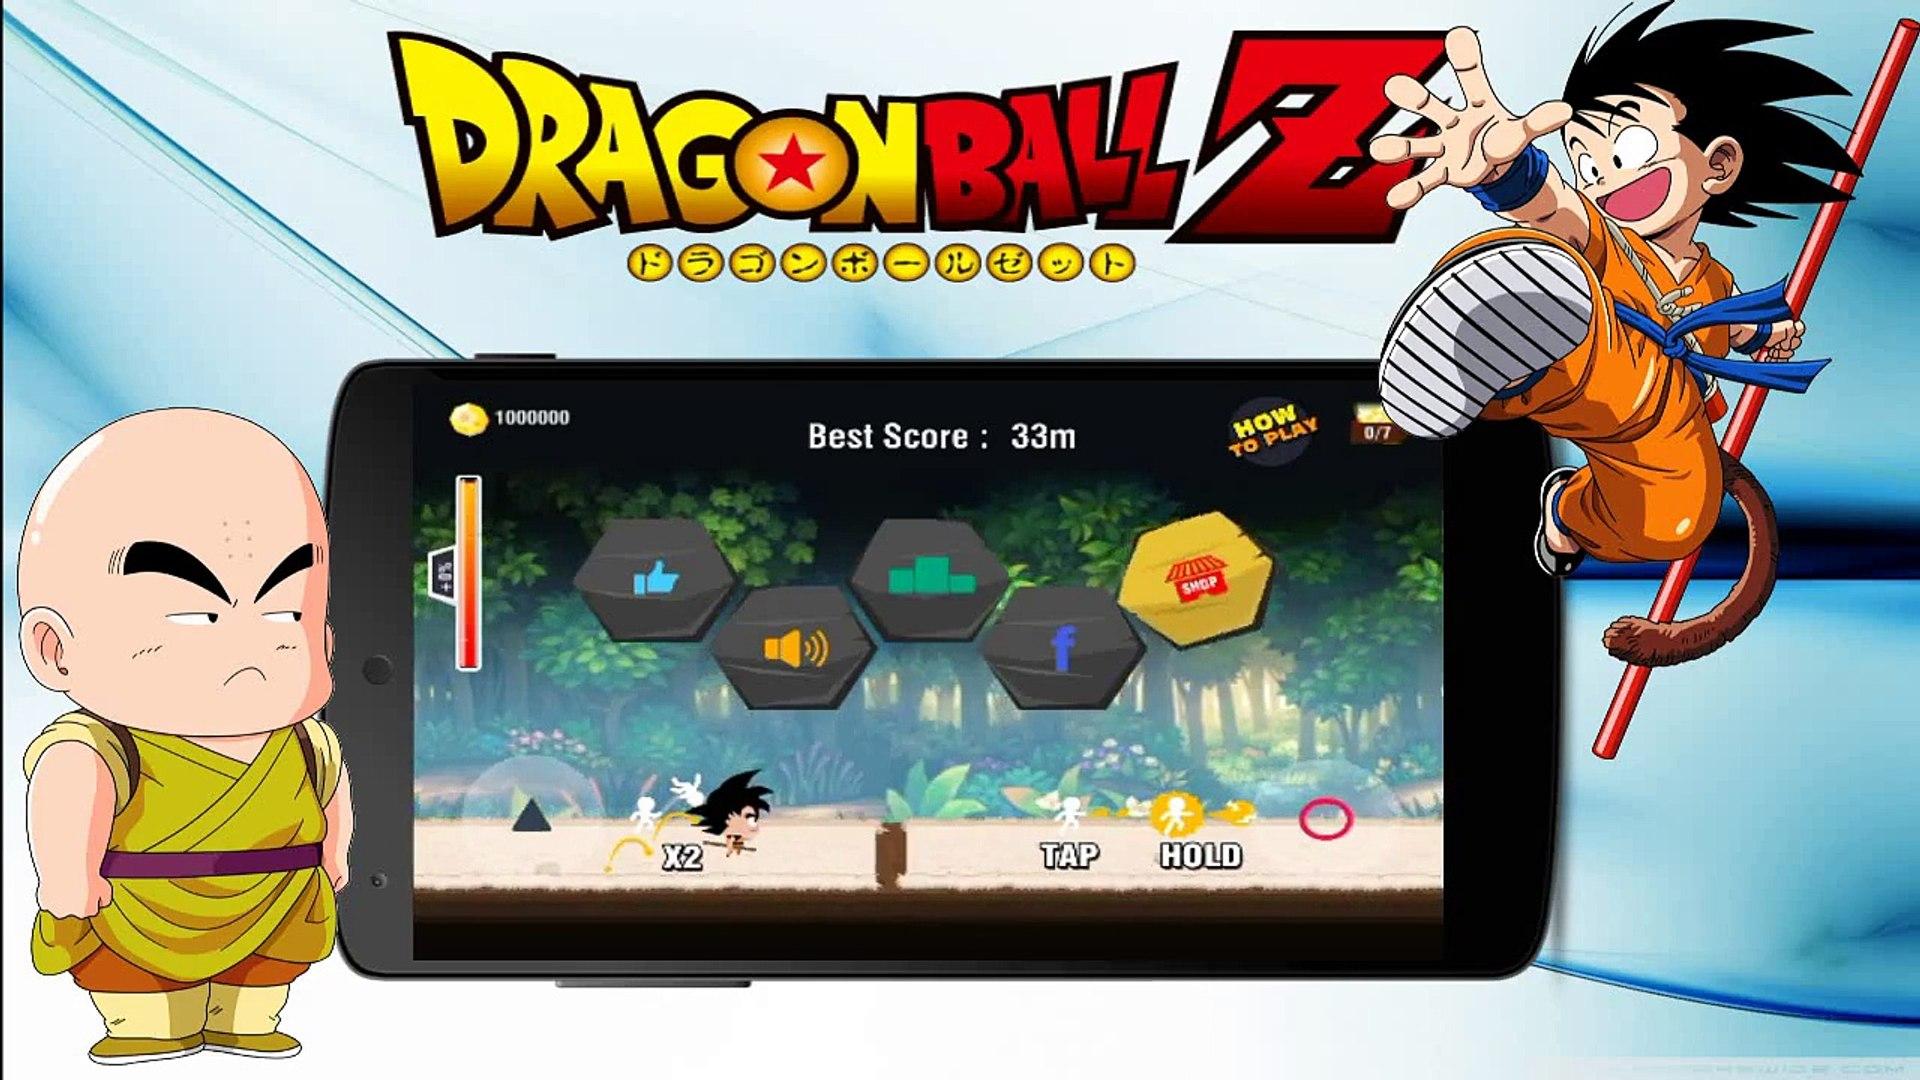 Dragon Ball Android game The Battle Of Saiyan Warrior v1 1 2 Apk Mod 2015  (HD)